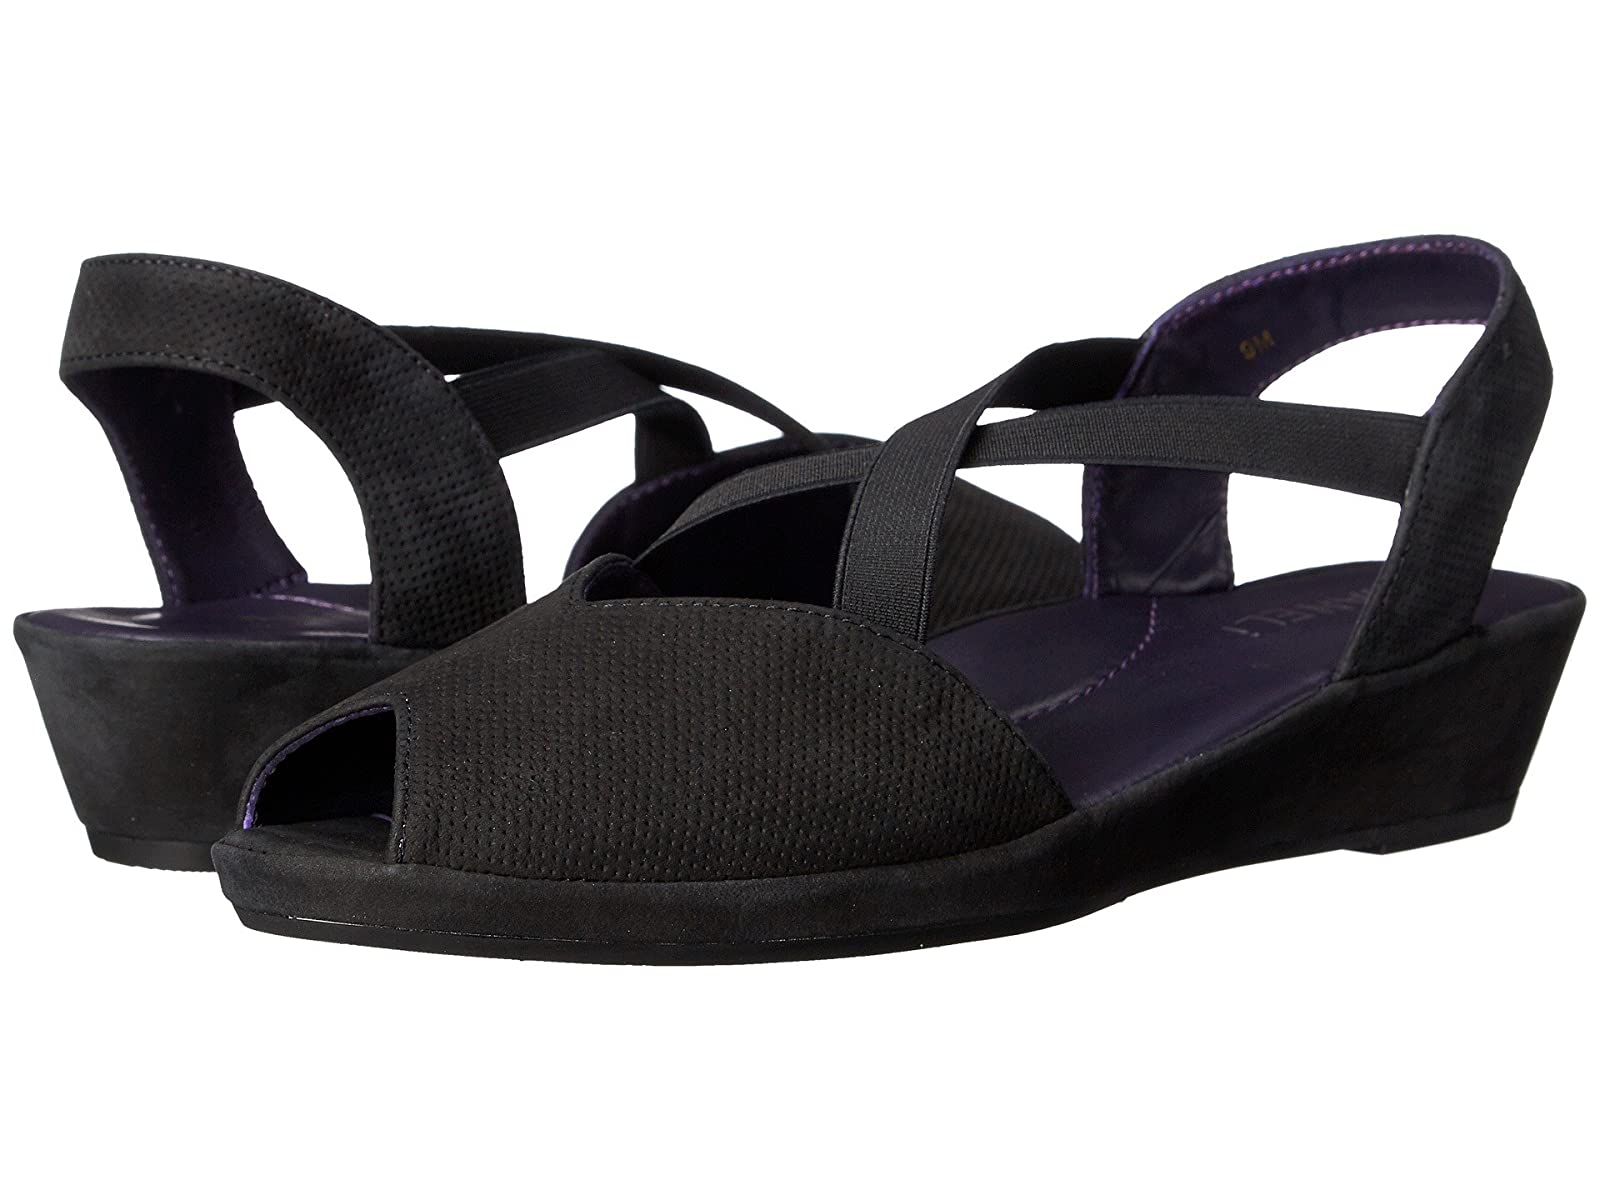 Vaneli DolbyCheap and distinctive eye-catching shoes